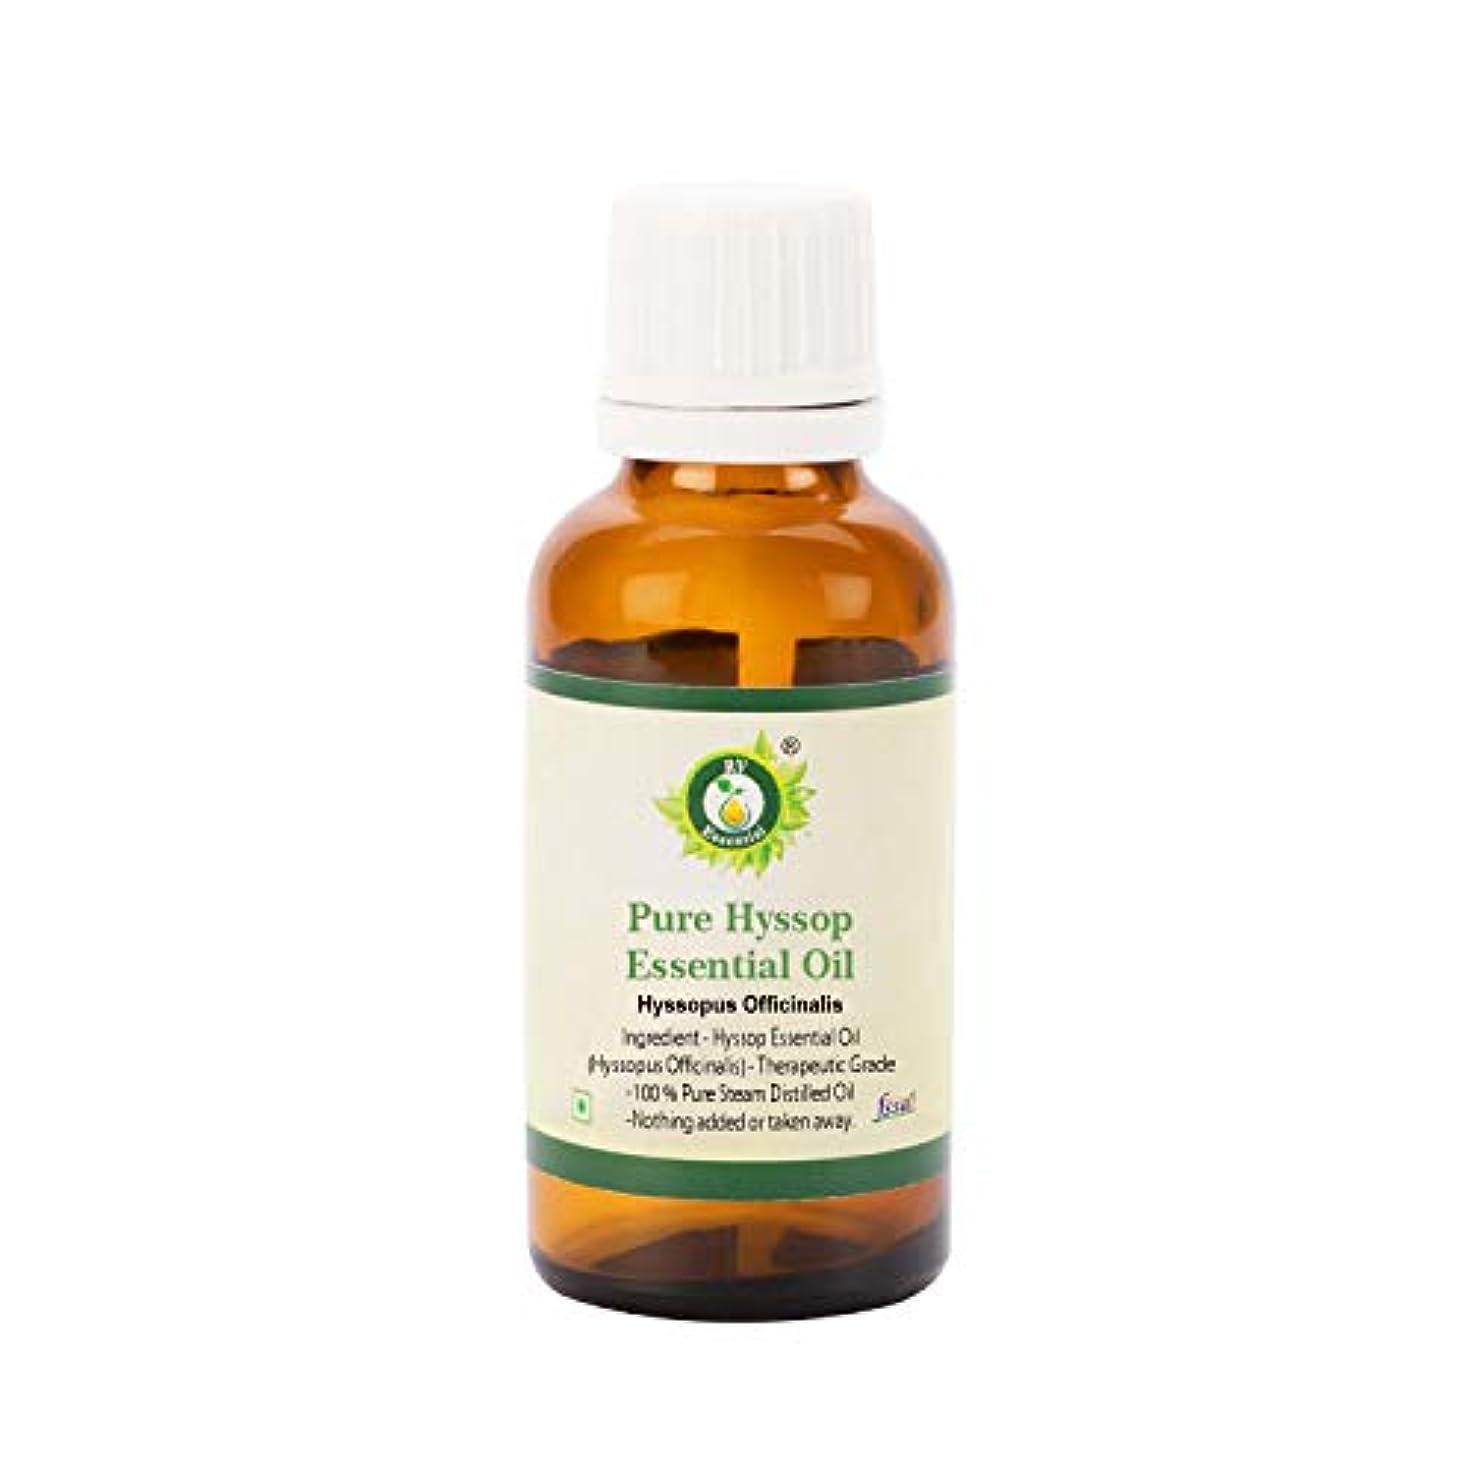 R V Essential ピュアヒソップエッセンシャルオイル10ml (0.338oz)- Hyssopus Officinalis (100%純粋&天然スチームDistilled) Pure Hyssop Essential...